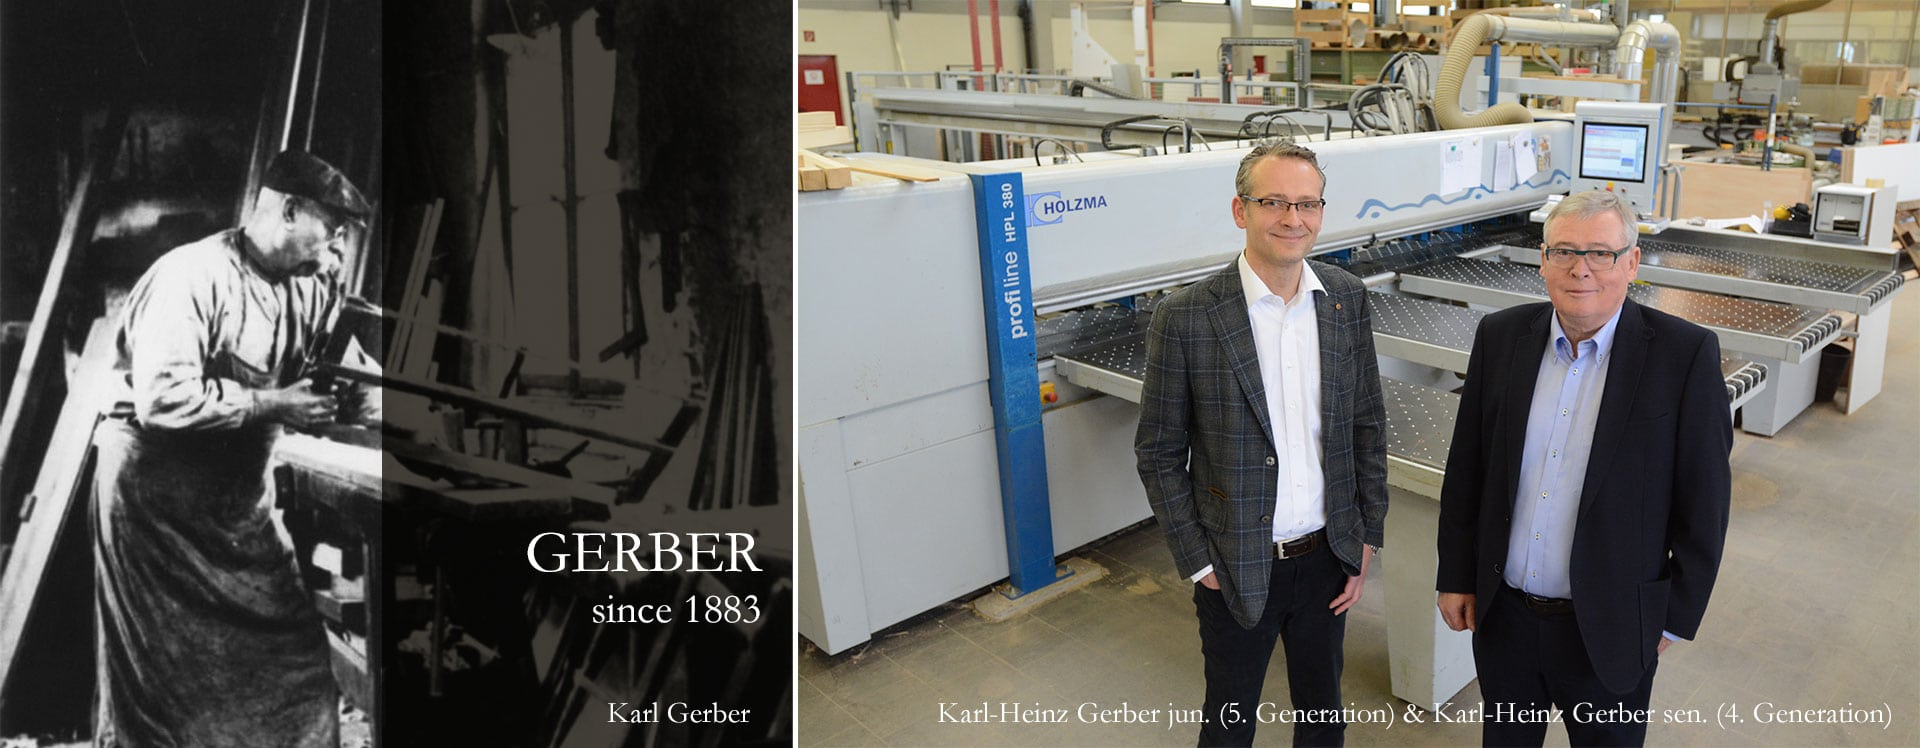 Gerber since 1883